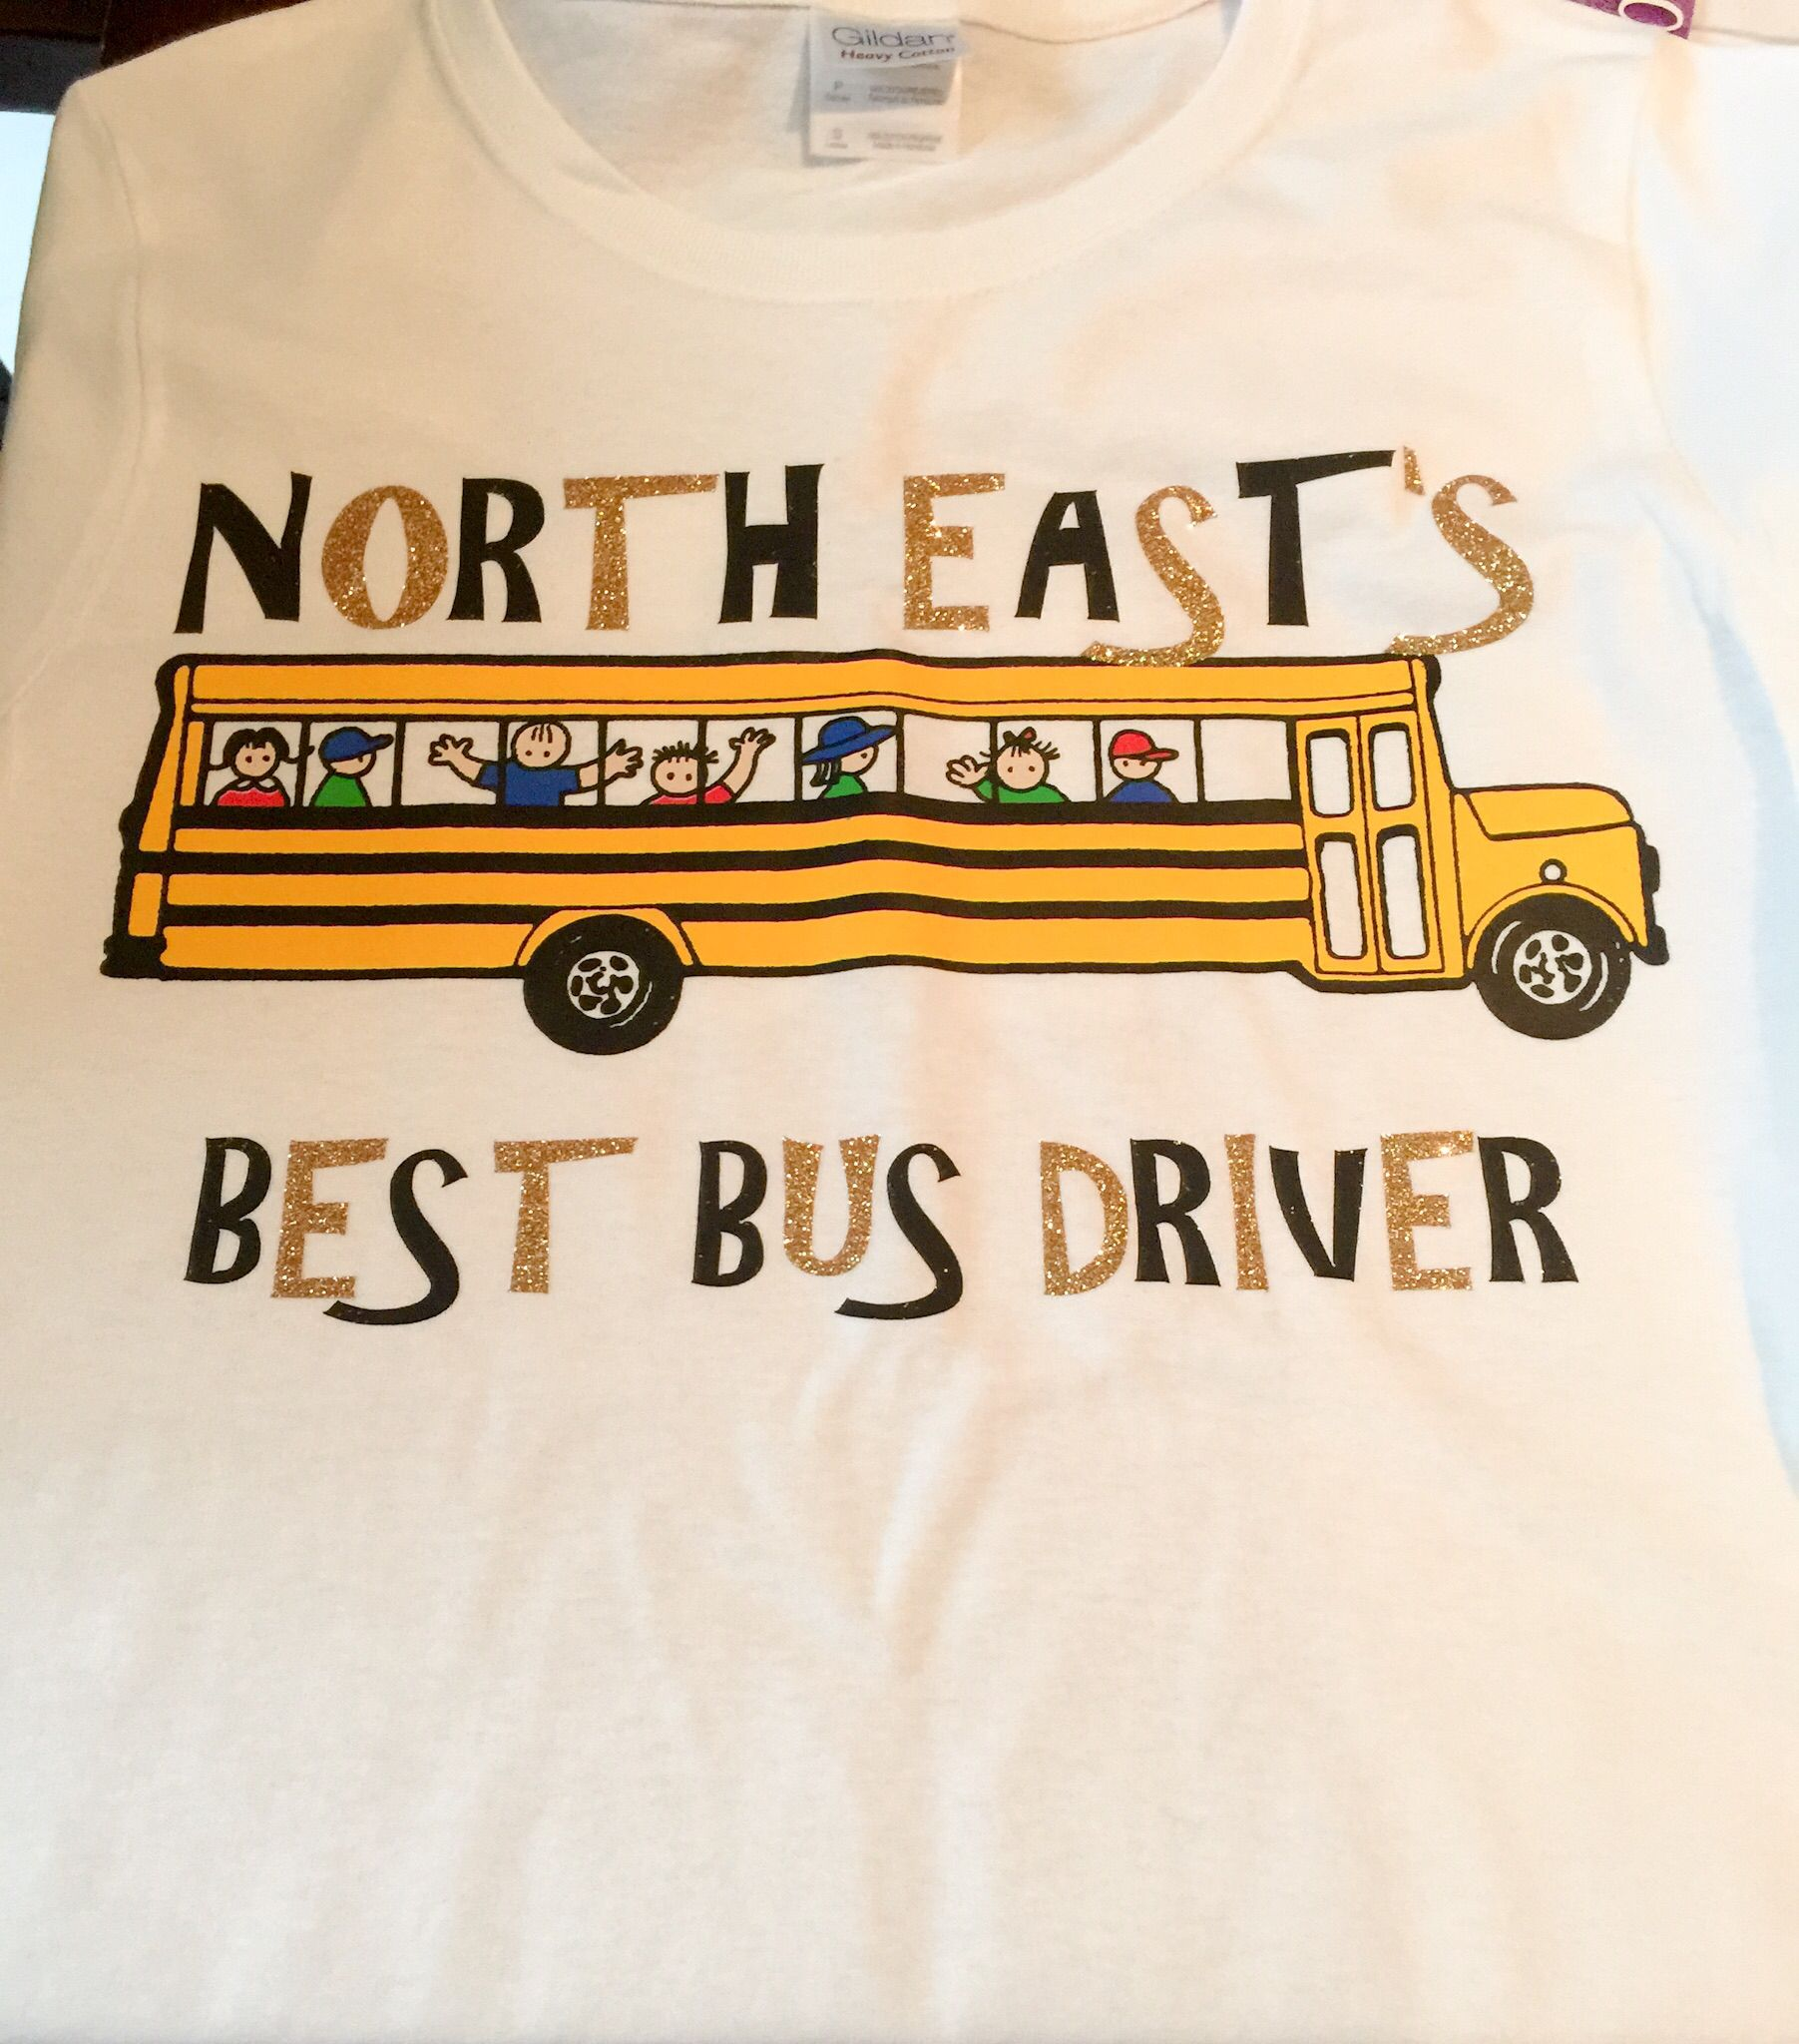 School Bus Driver Bus Driver School Bus Driver Emergency Medical Technician